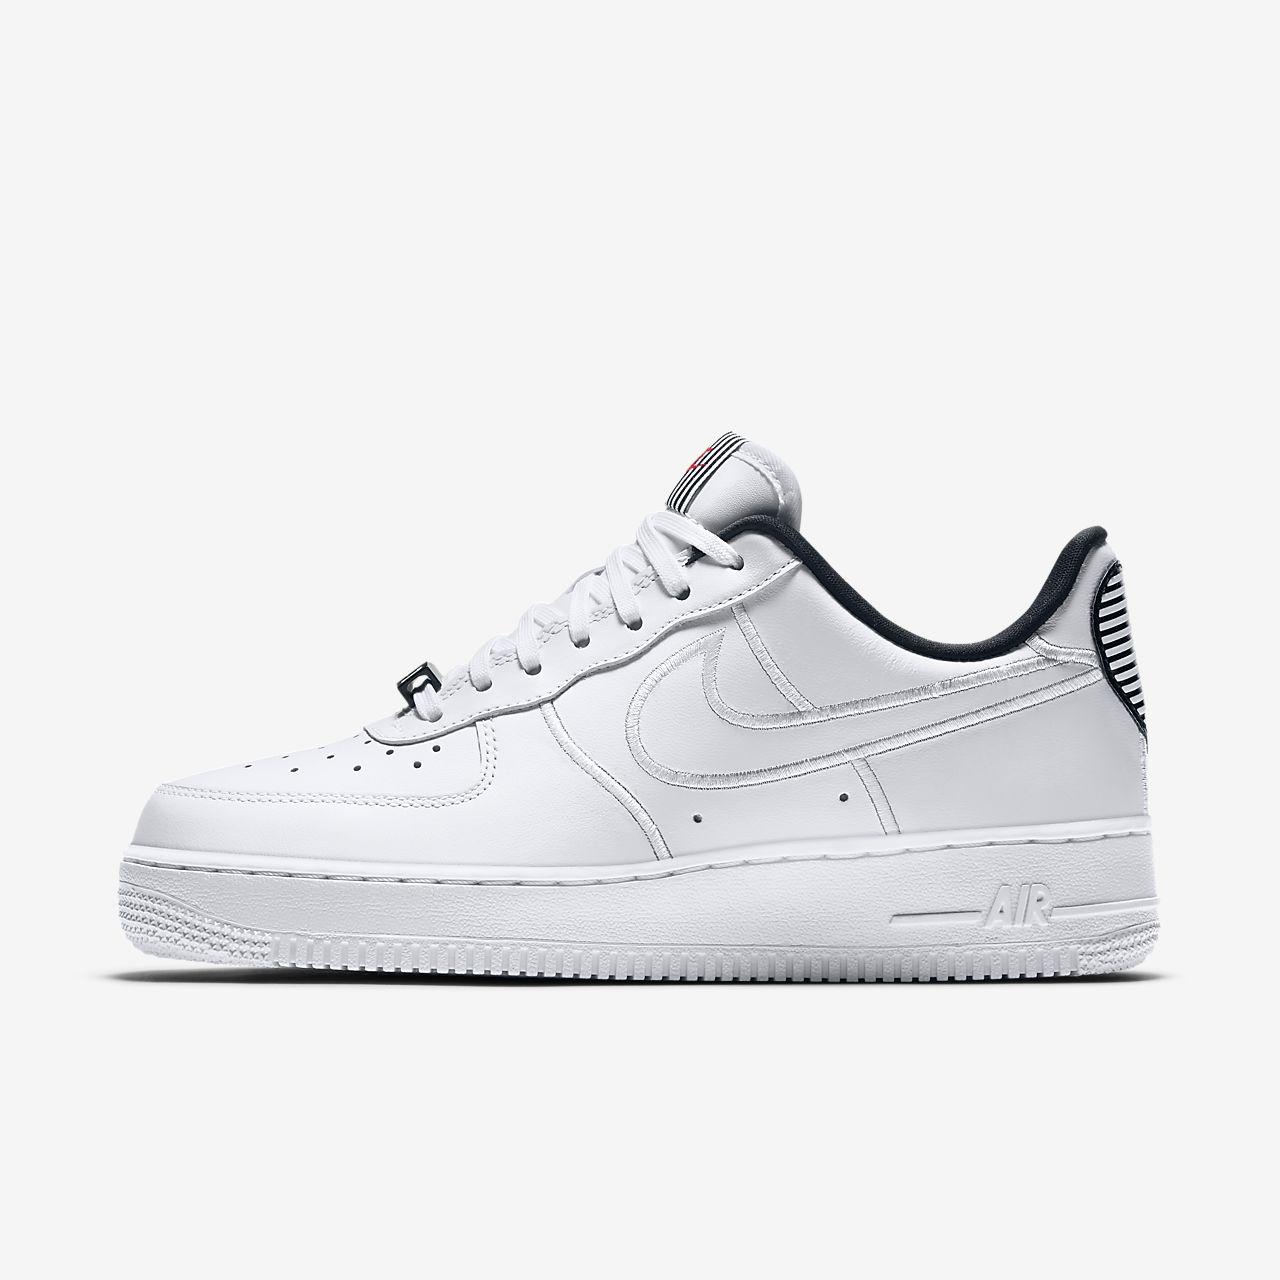 Nike Air Force 1 '07 SE LX 女子运动鞋